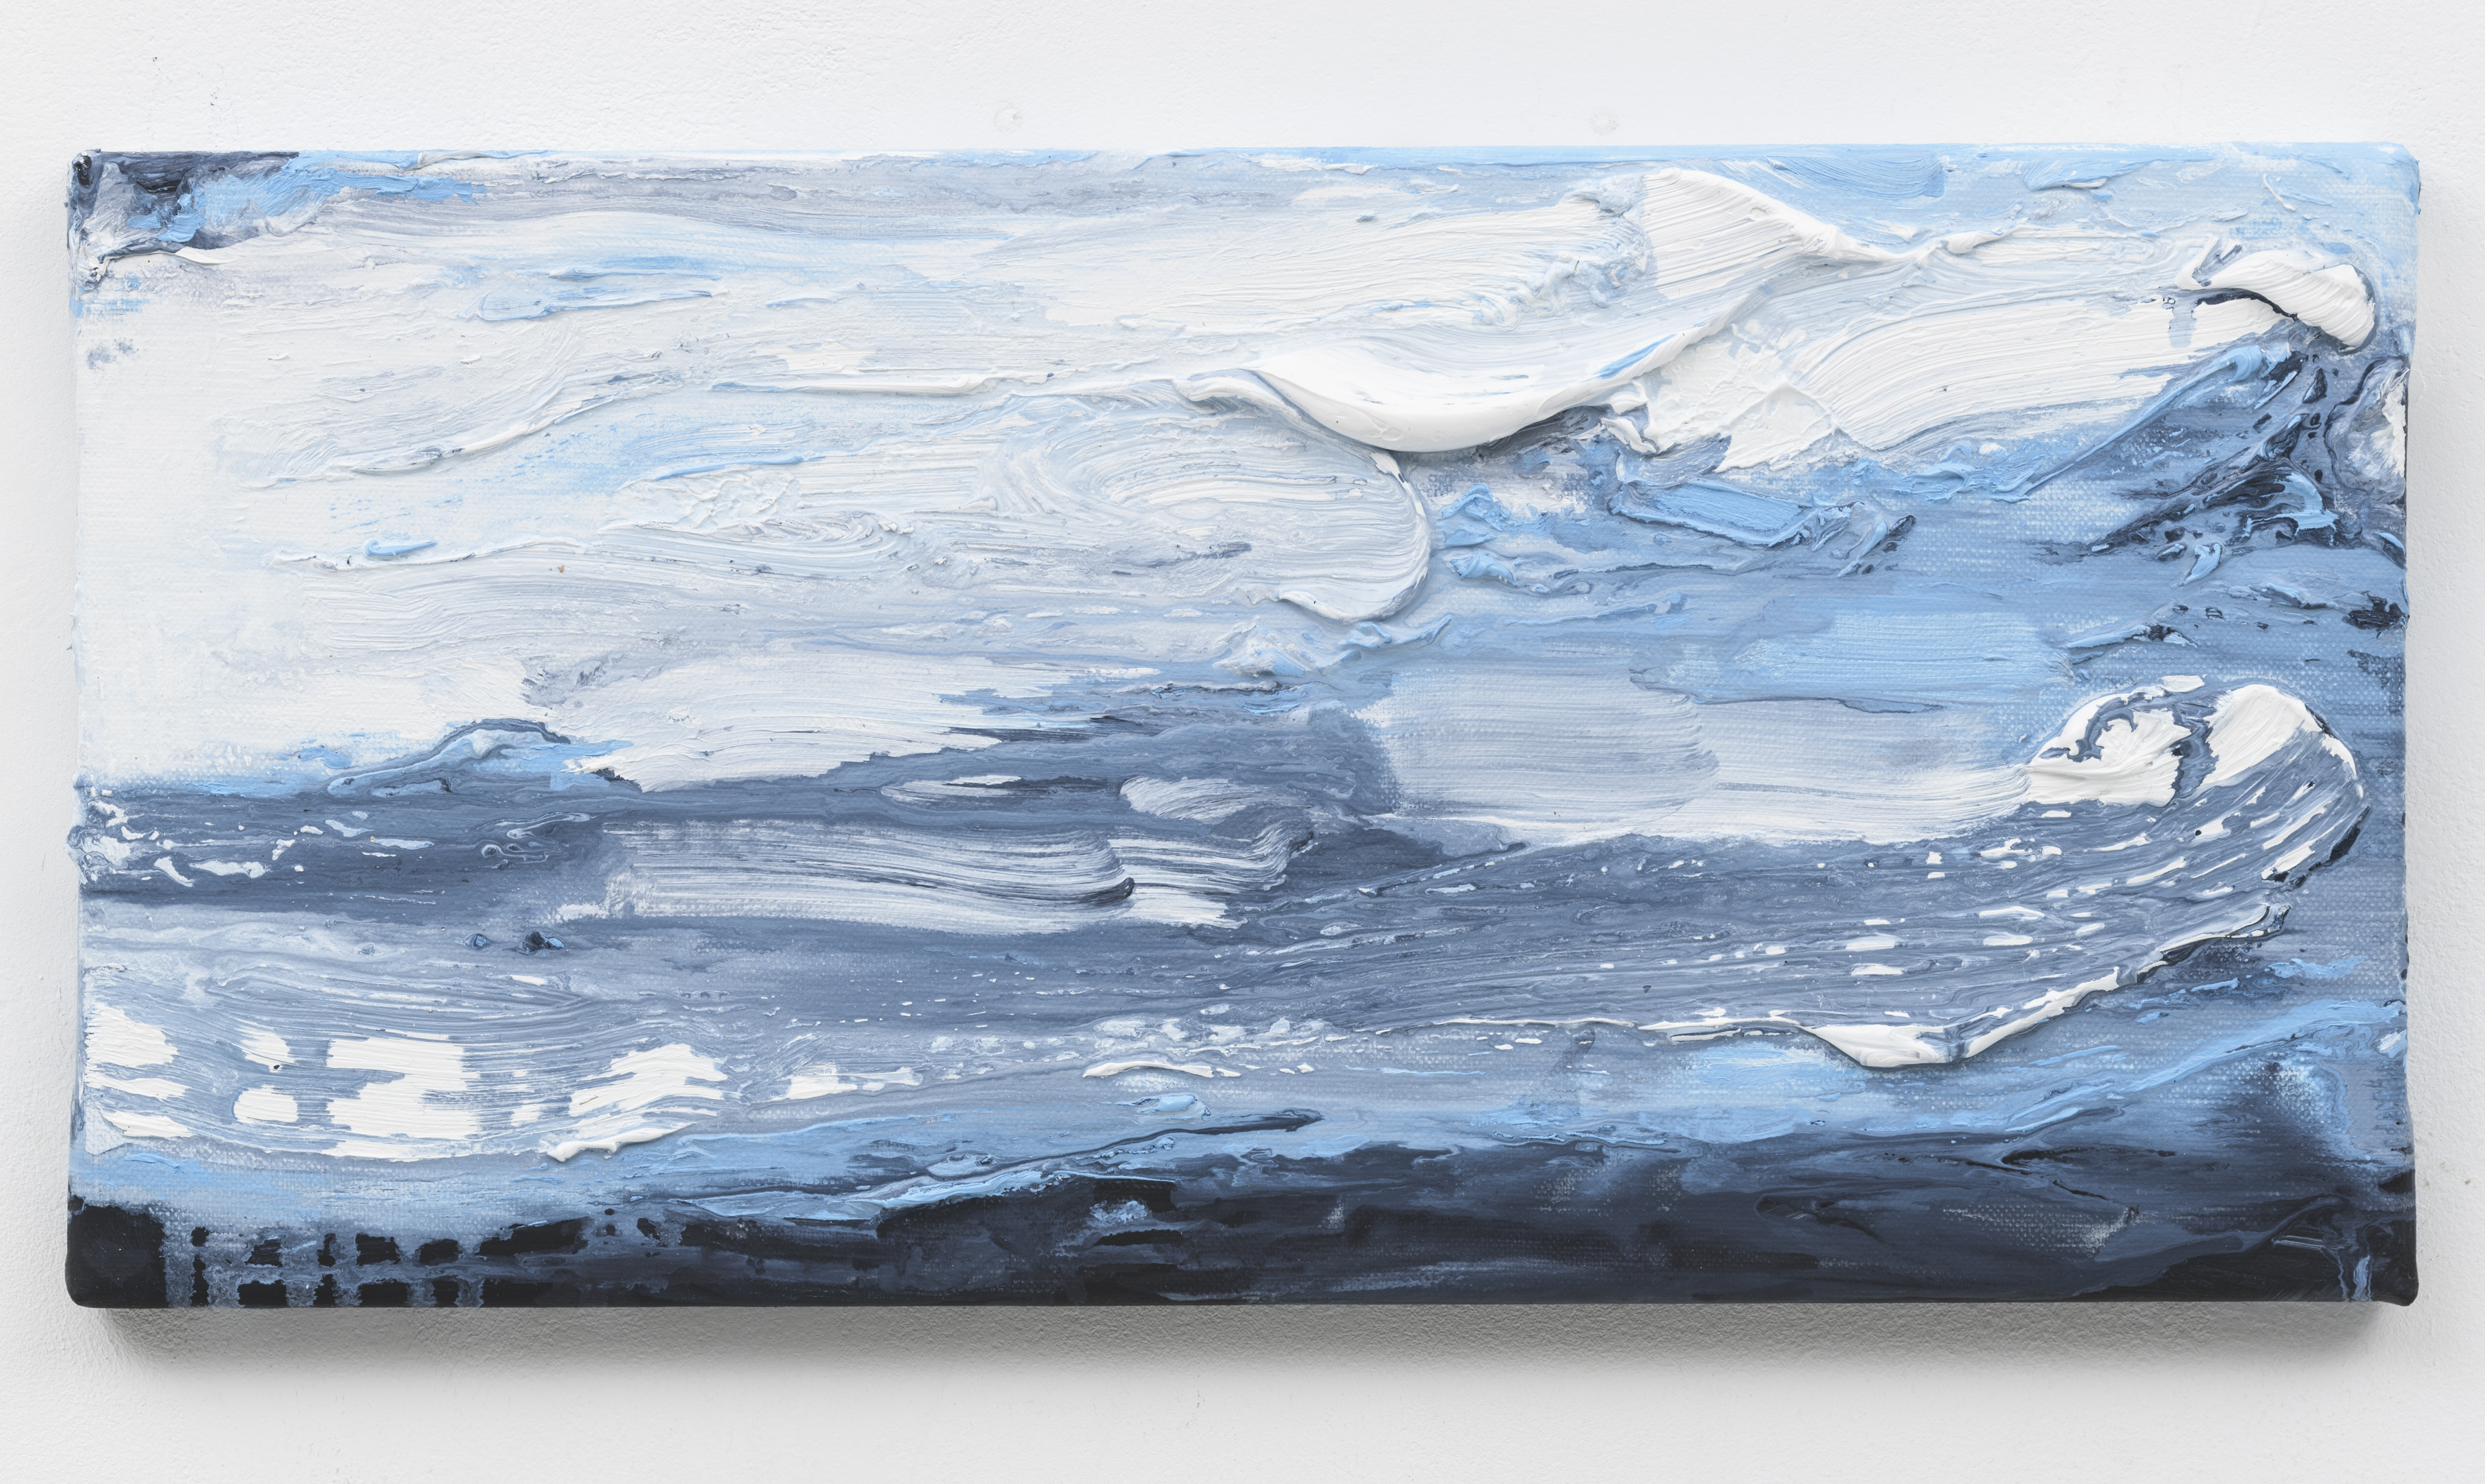 """Wanderung X, Berlin Suite"" 20 x 40 cm. oil on linen 2018 (Special Edition, Berlin)"